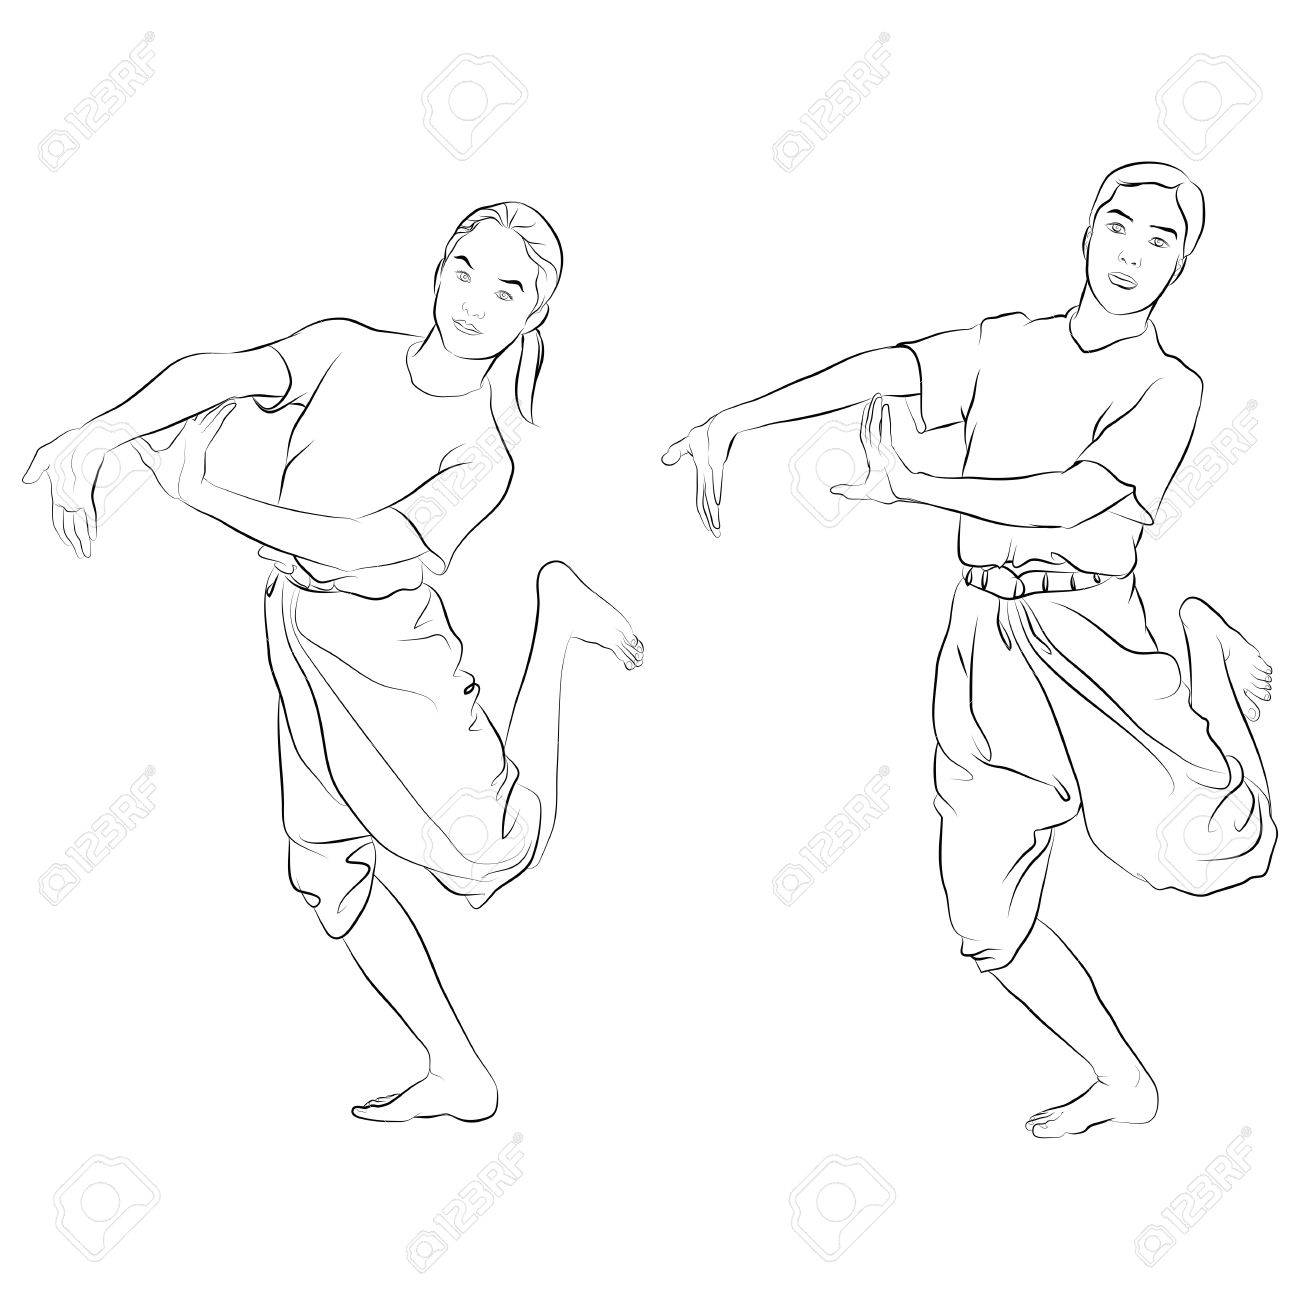 traditional Thai dancer called Dancing - pair or RAM-KOO Body language the art of Thai dance - 15431429